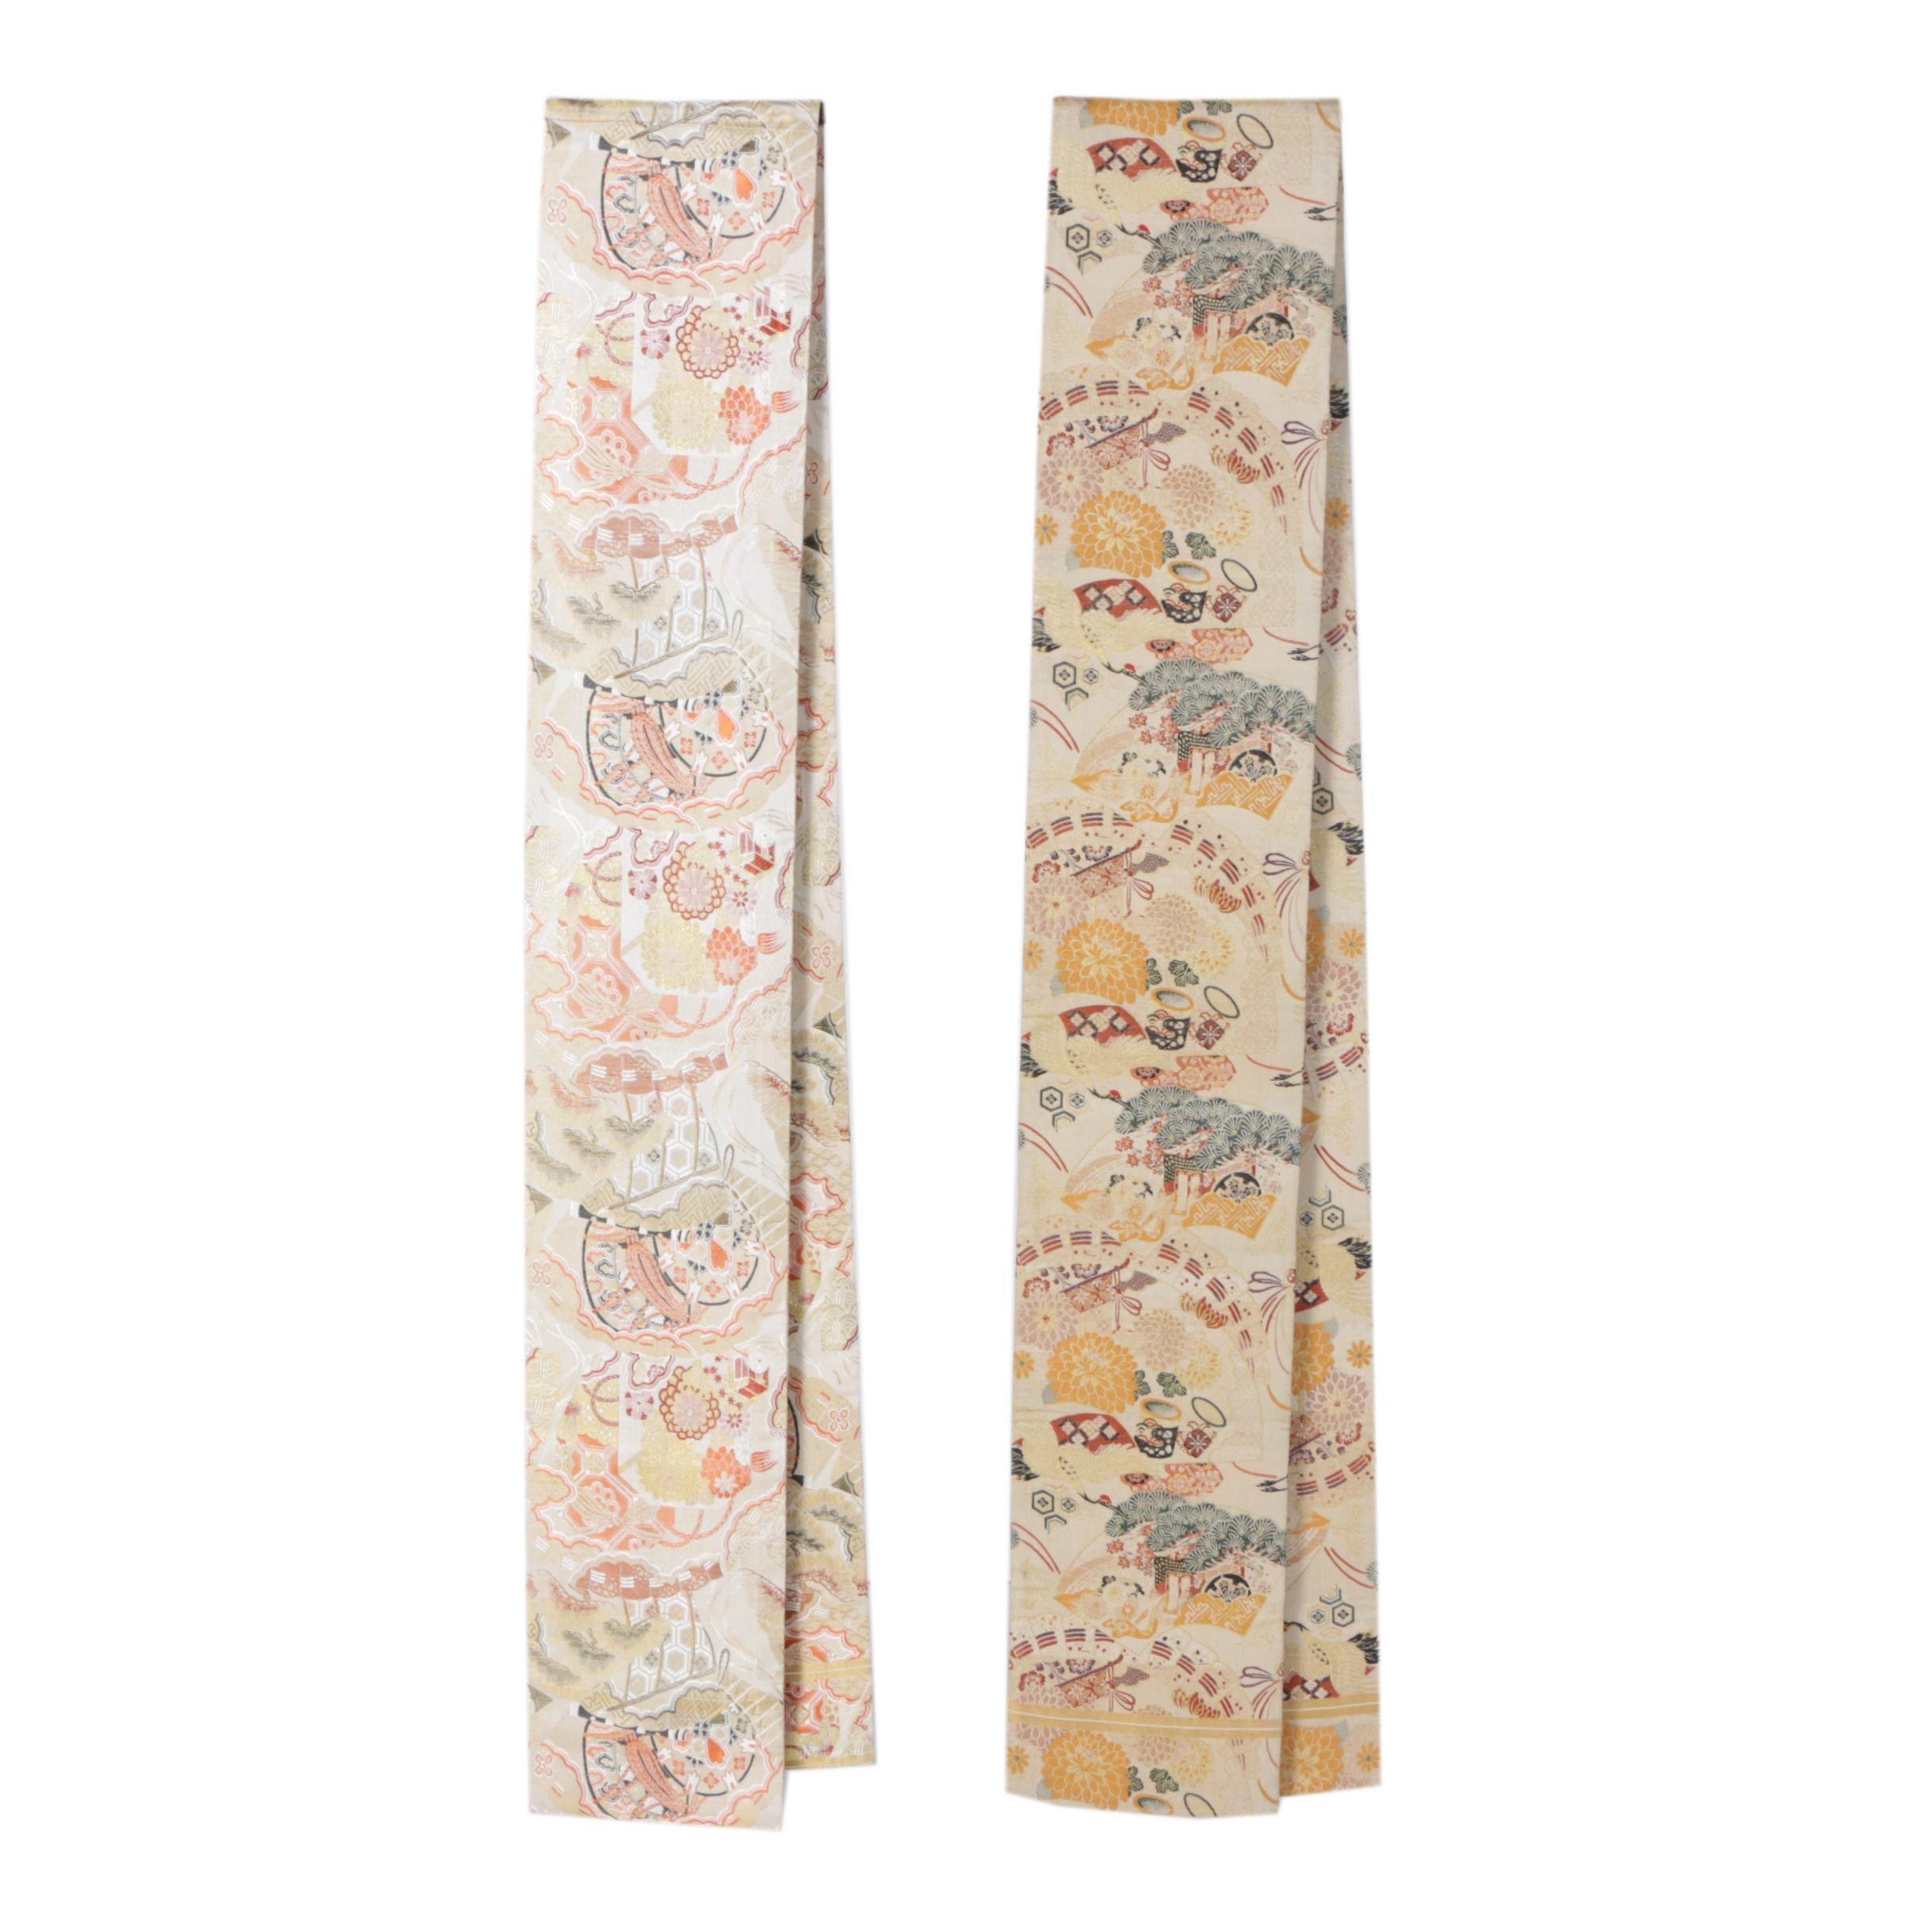 Vintage Japanese Silk Brocade Obis